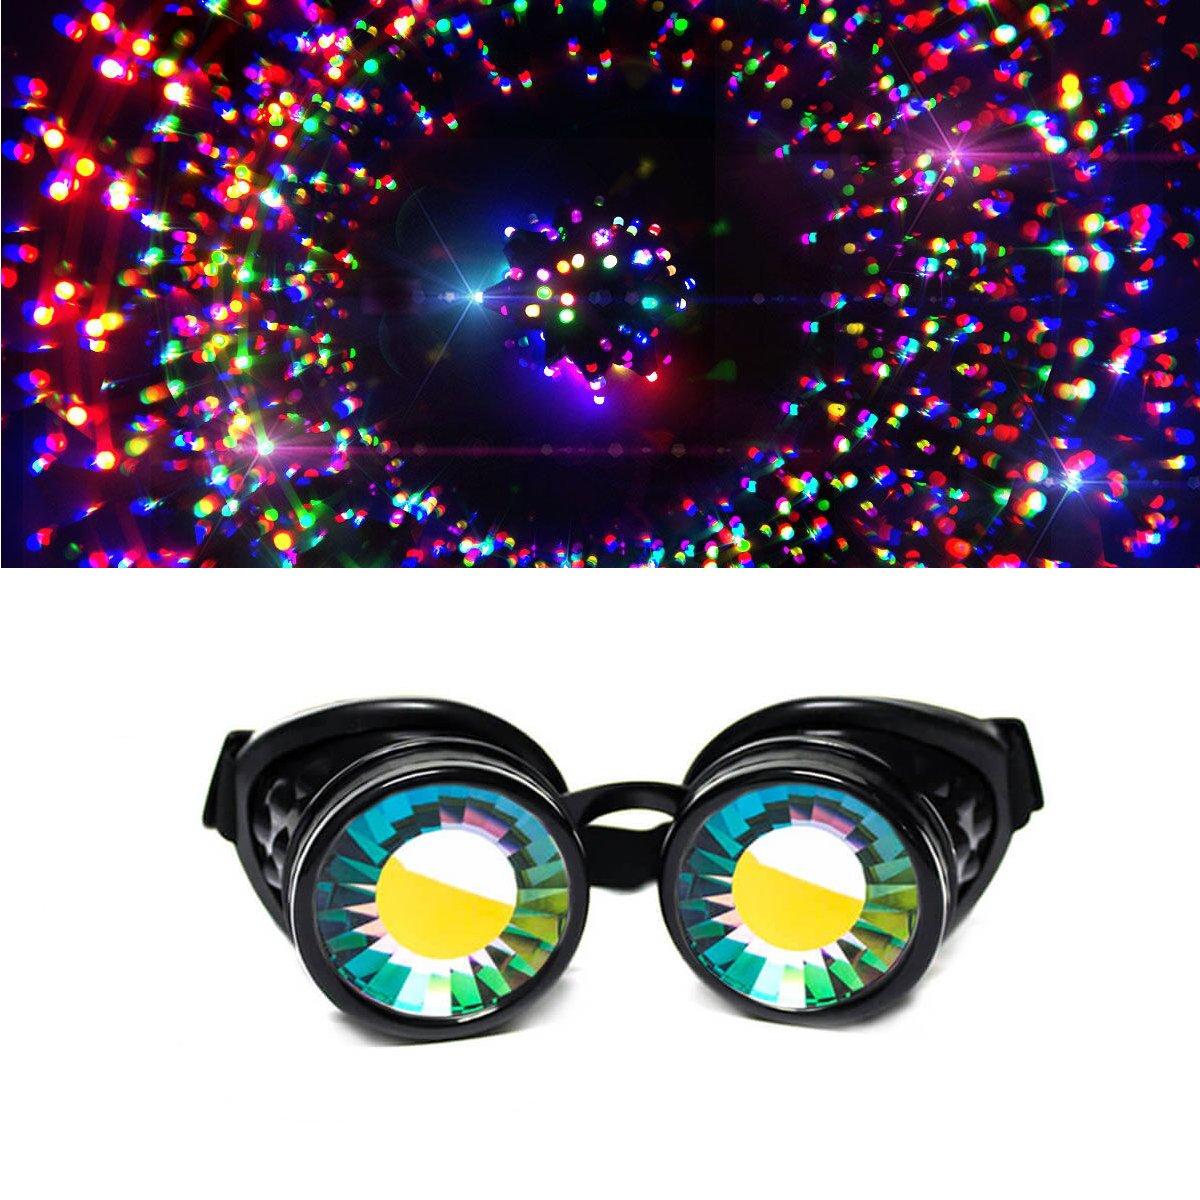 509e7459d2f0b GloFX Black Padded Kaleidoscope Goggles - Wormhole Lens - Adjustable Strap  - EDM Rave 3d Prism